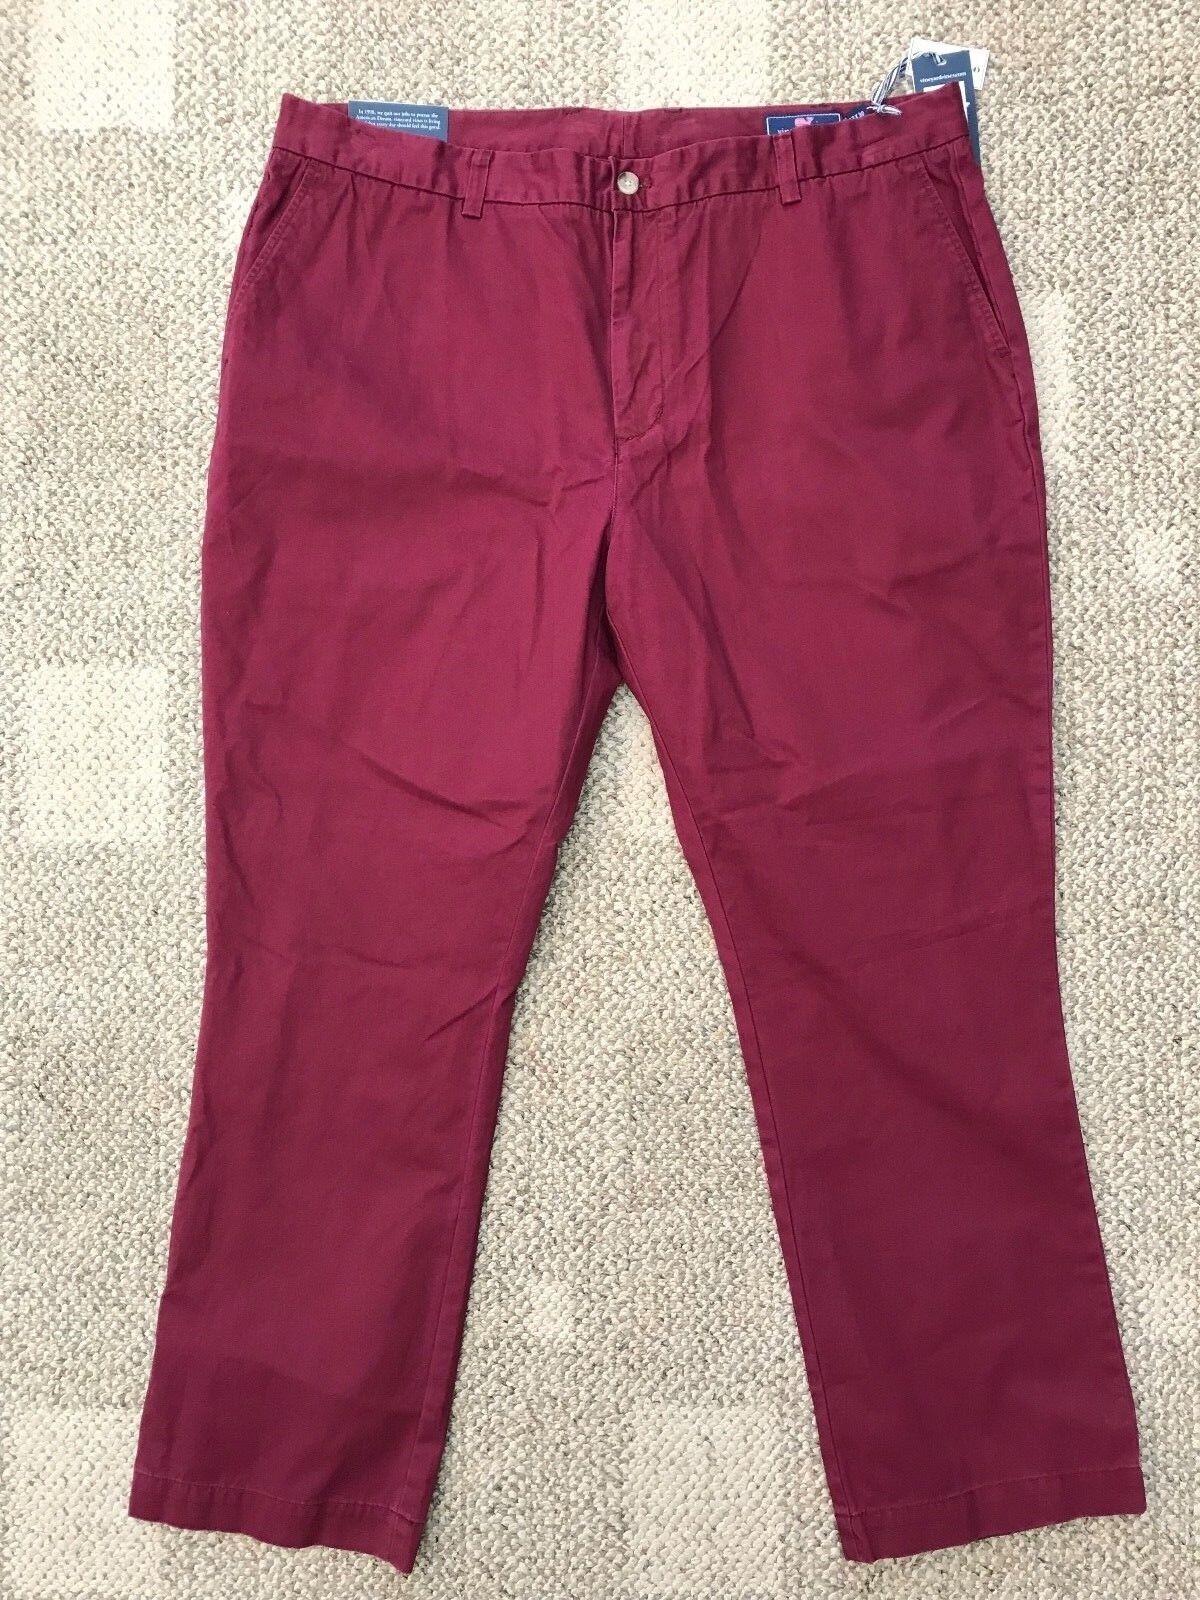 Vineyard Vines Mens Slim Breaker Casual Pants Crimson Burgundy Red Size 40 X 32